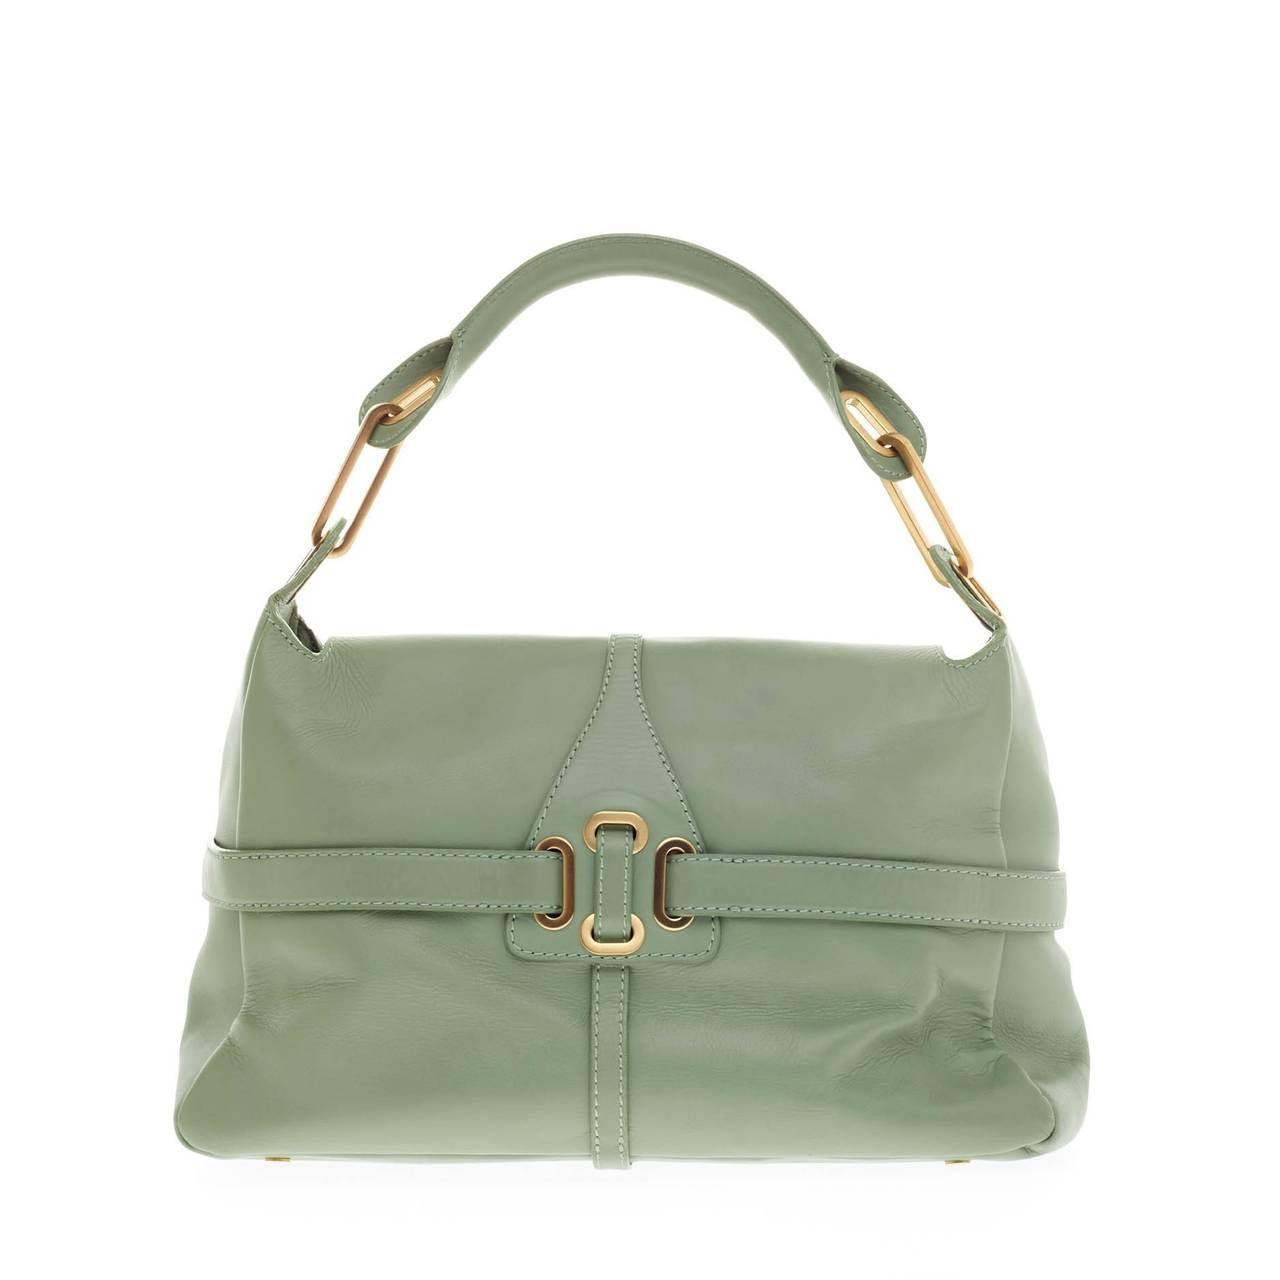 Jimmy Choo Tulita Shoulder Bag Leather 4